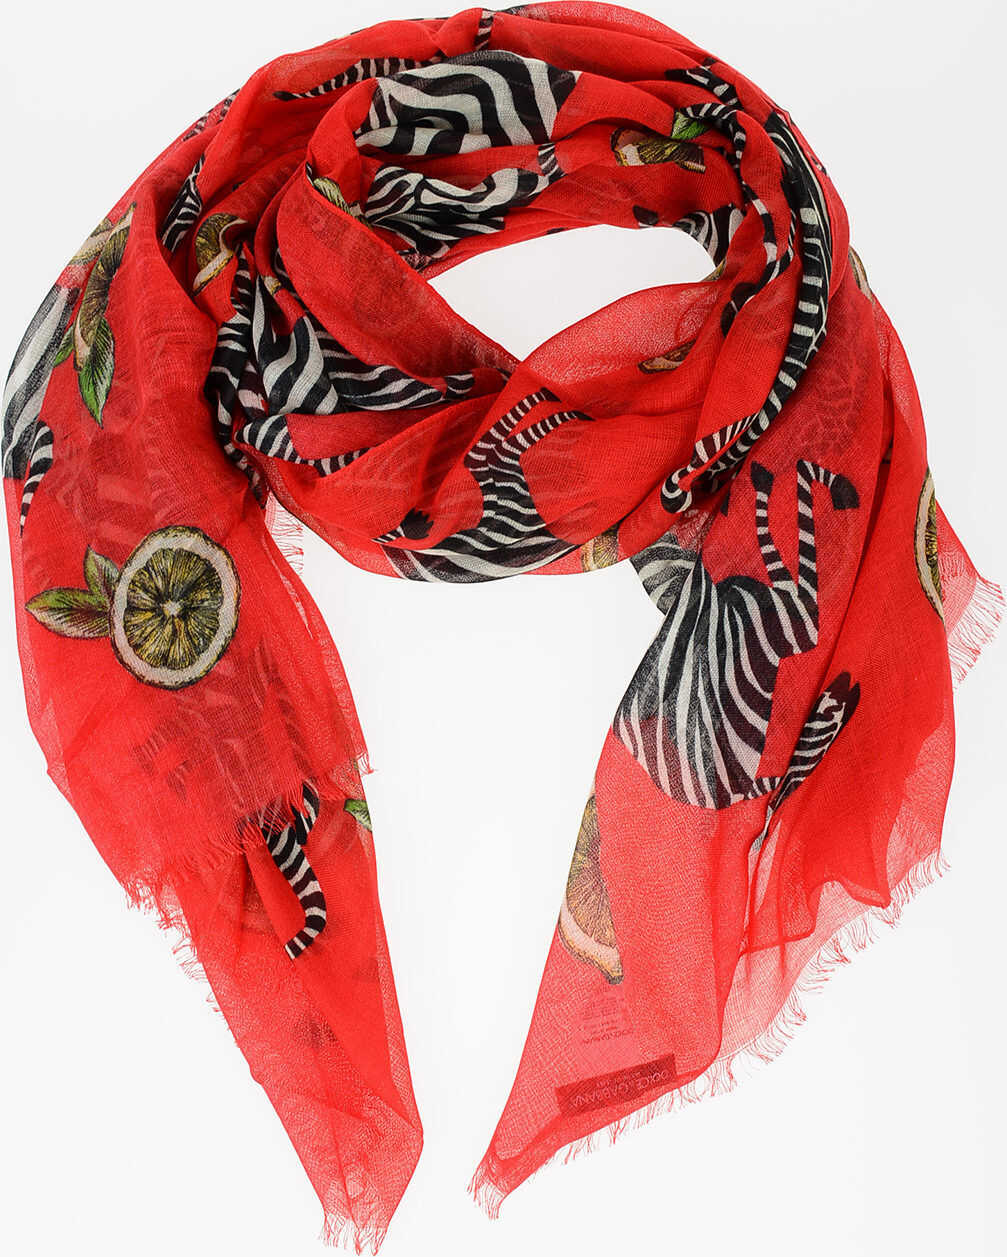 Dolce & Gabbana Cashmere blend scarf With Zebra Print RED